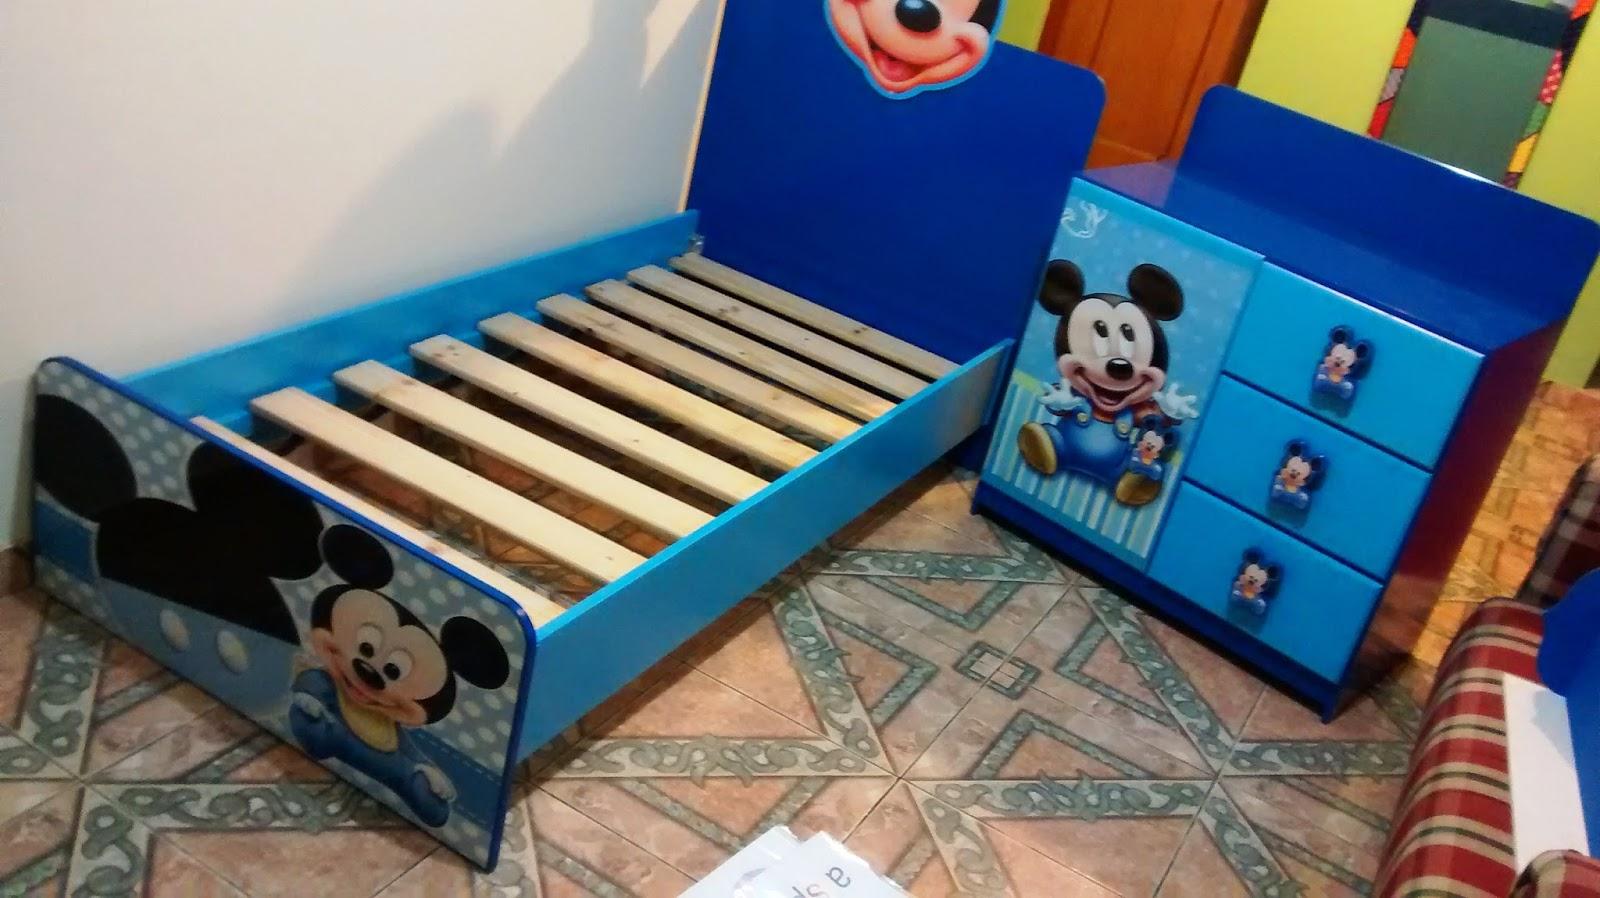 Galeria arte y dise o madekids camas infantiles - Muebles de mickey mouse ...